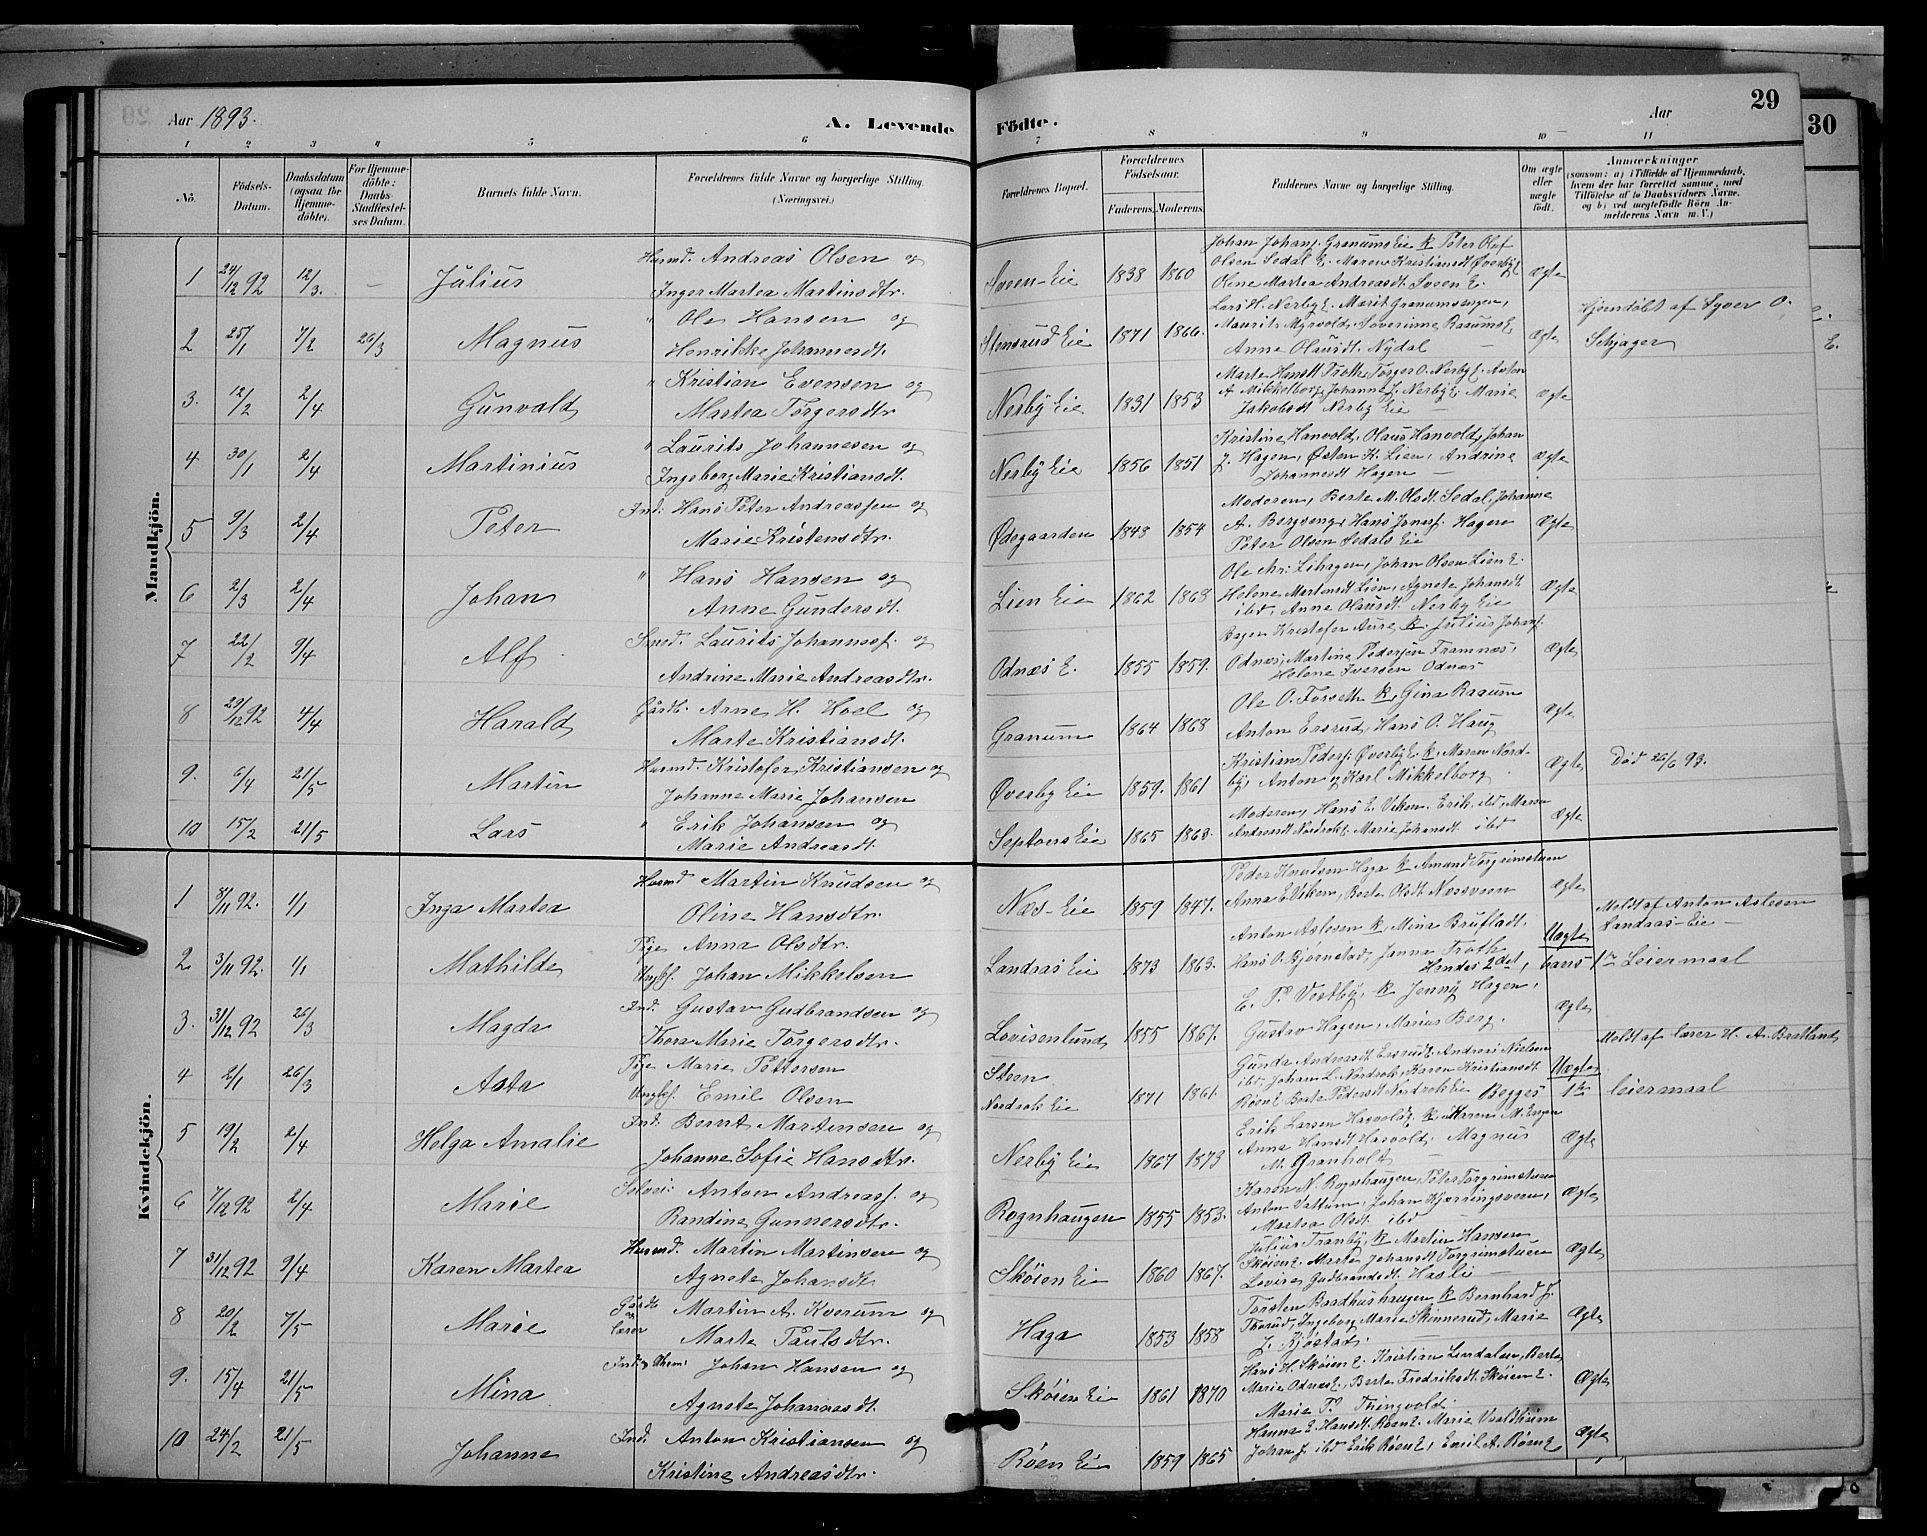 SAH, Søndre Land prestekontor, L/L0003: Klokkerbok nr. 3, 1884-1902, s. 29